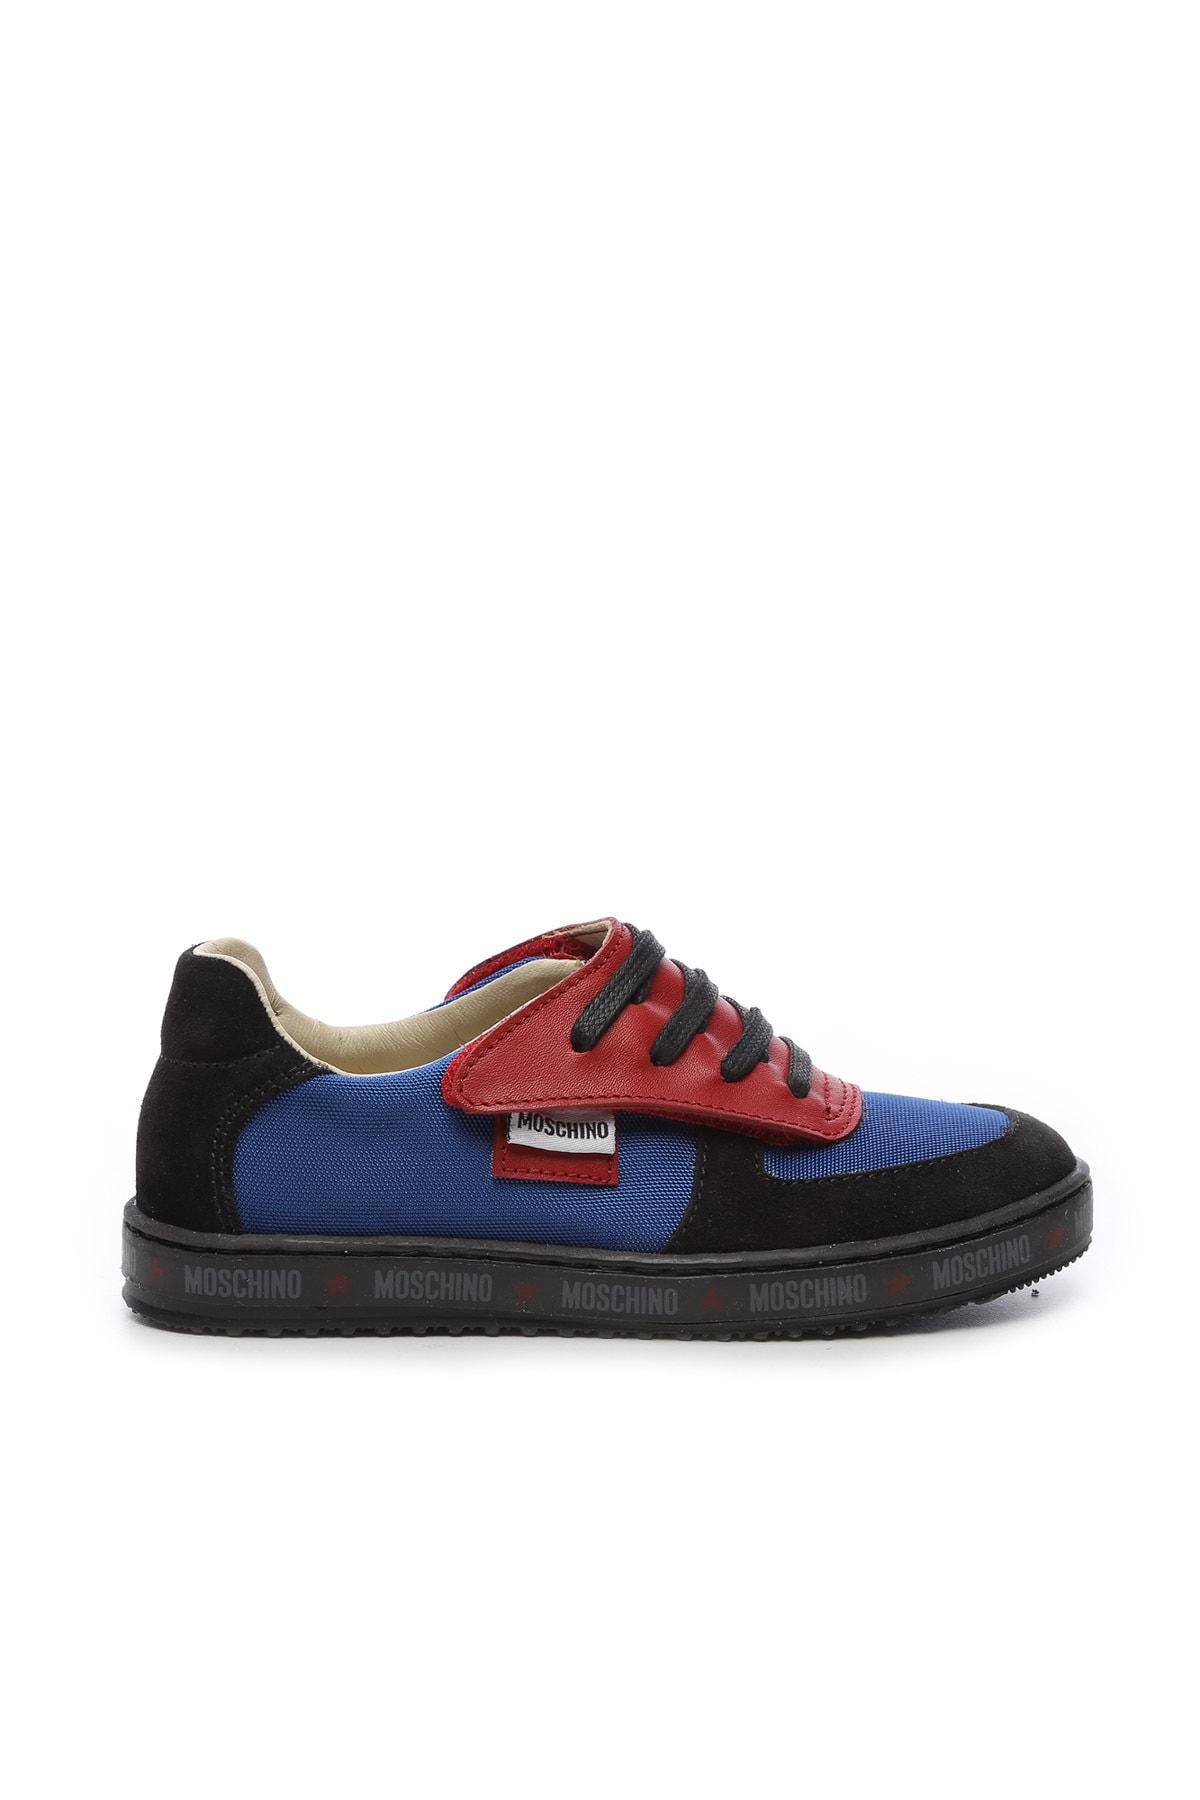 Moschino Çocuk Derı Spor Ayakkabı 104 25540 COCUK PATIK 1